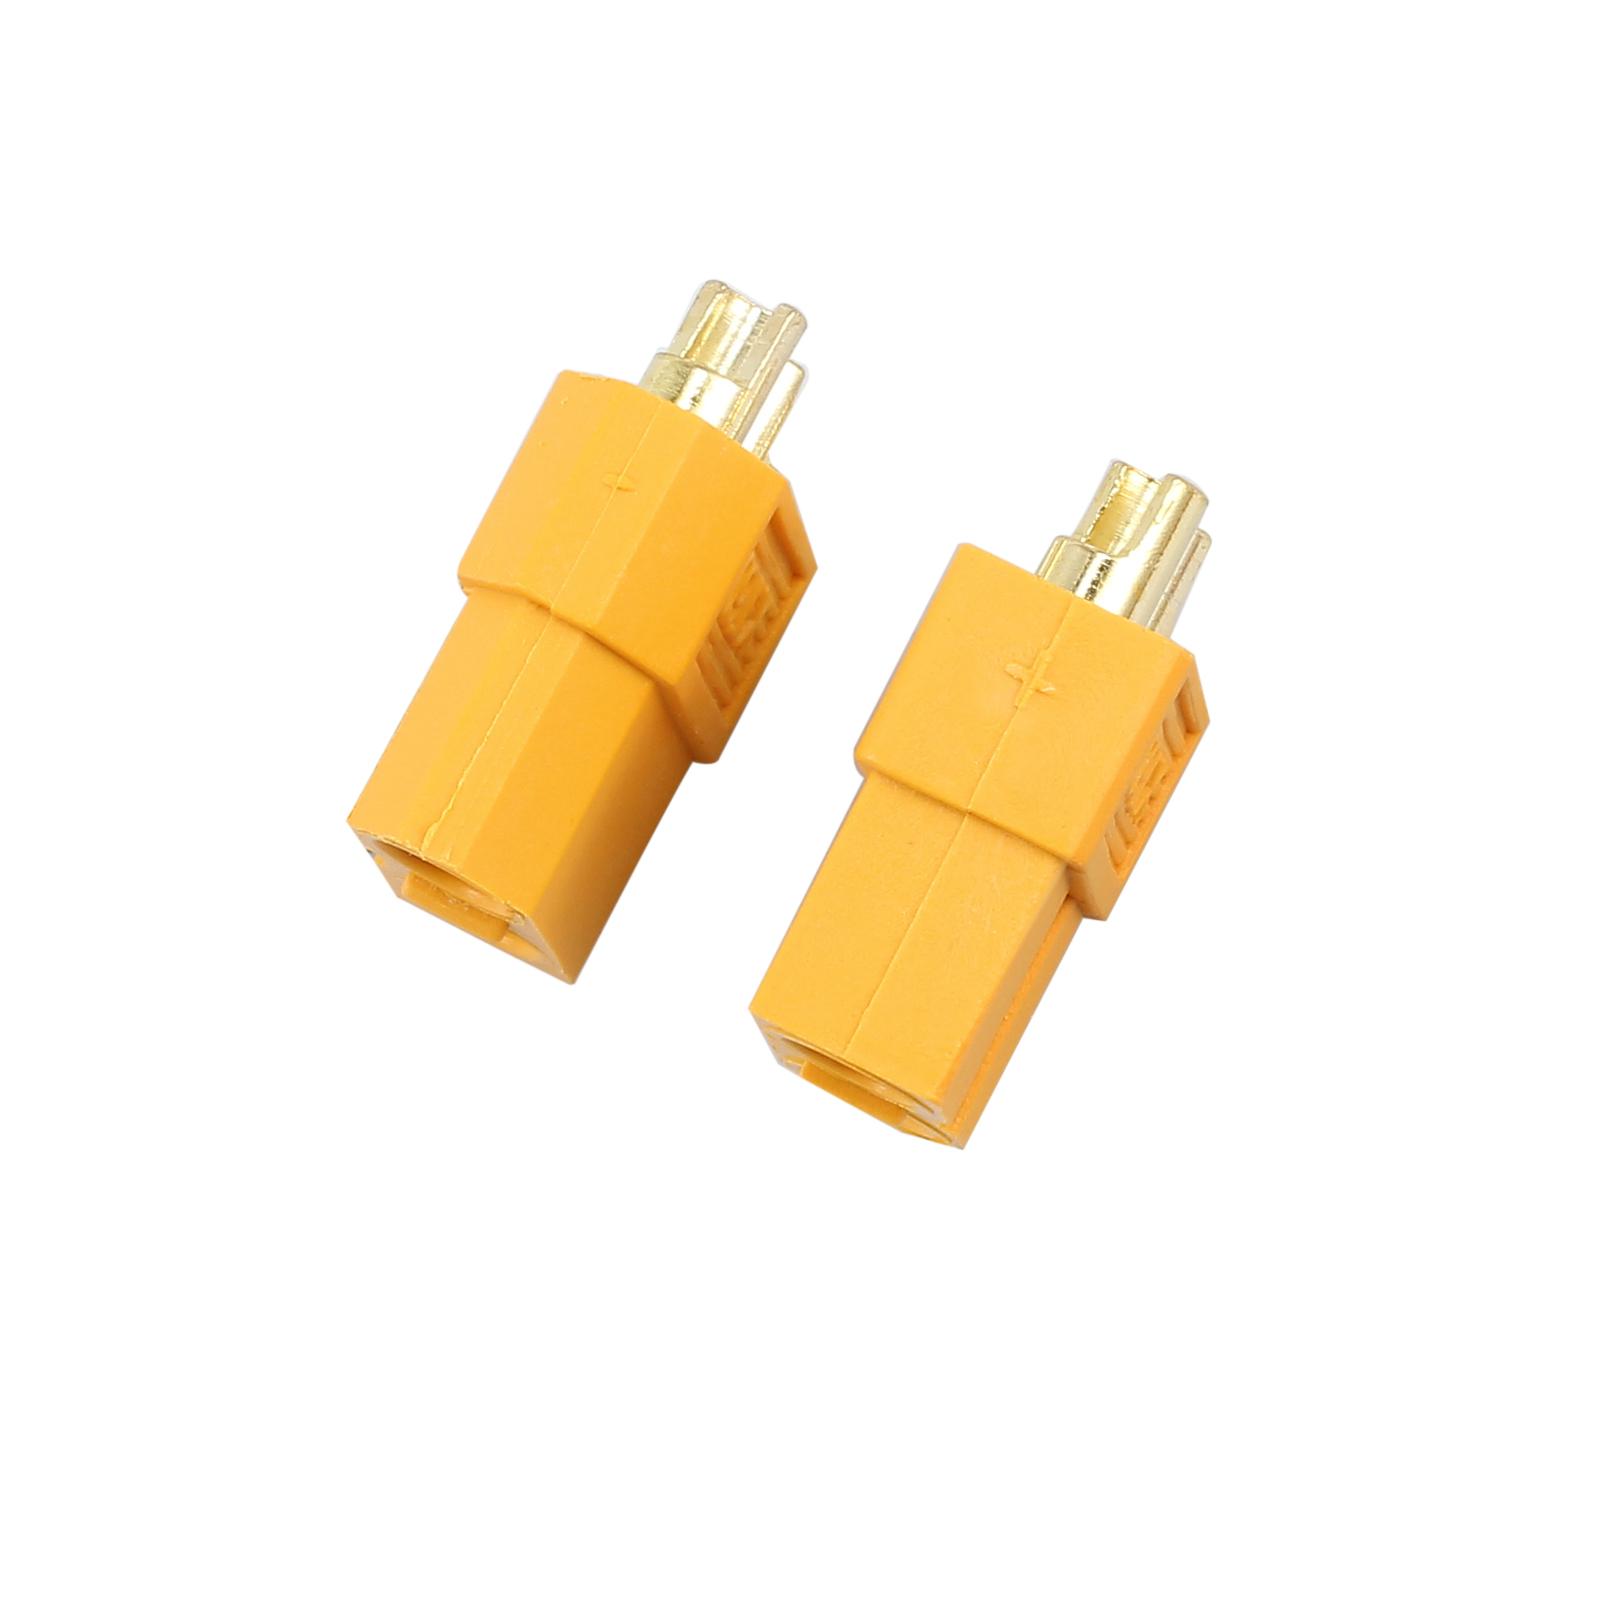 2 Paar 2Pin 1.25mm 1,25mm Mikro Micro JST Stecker Buchse 10cm 28AWG Kabel RC